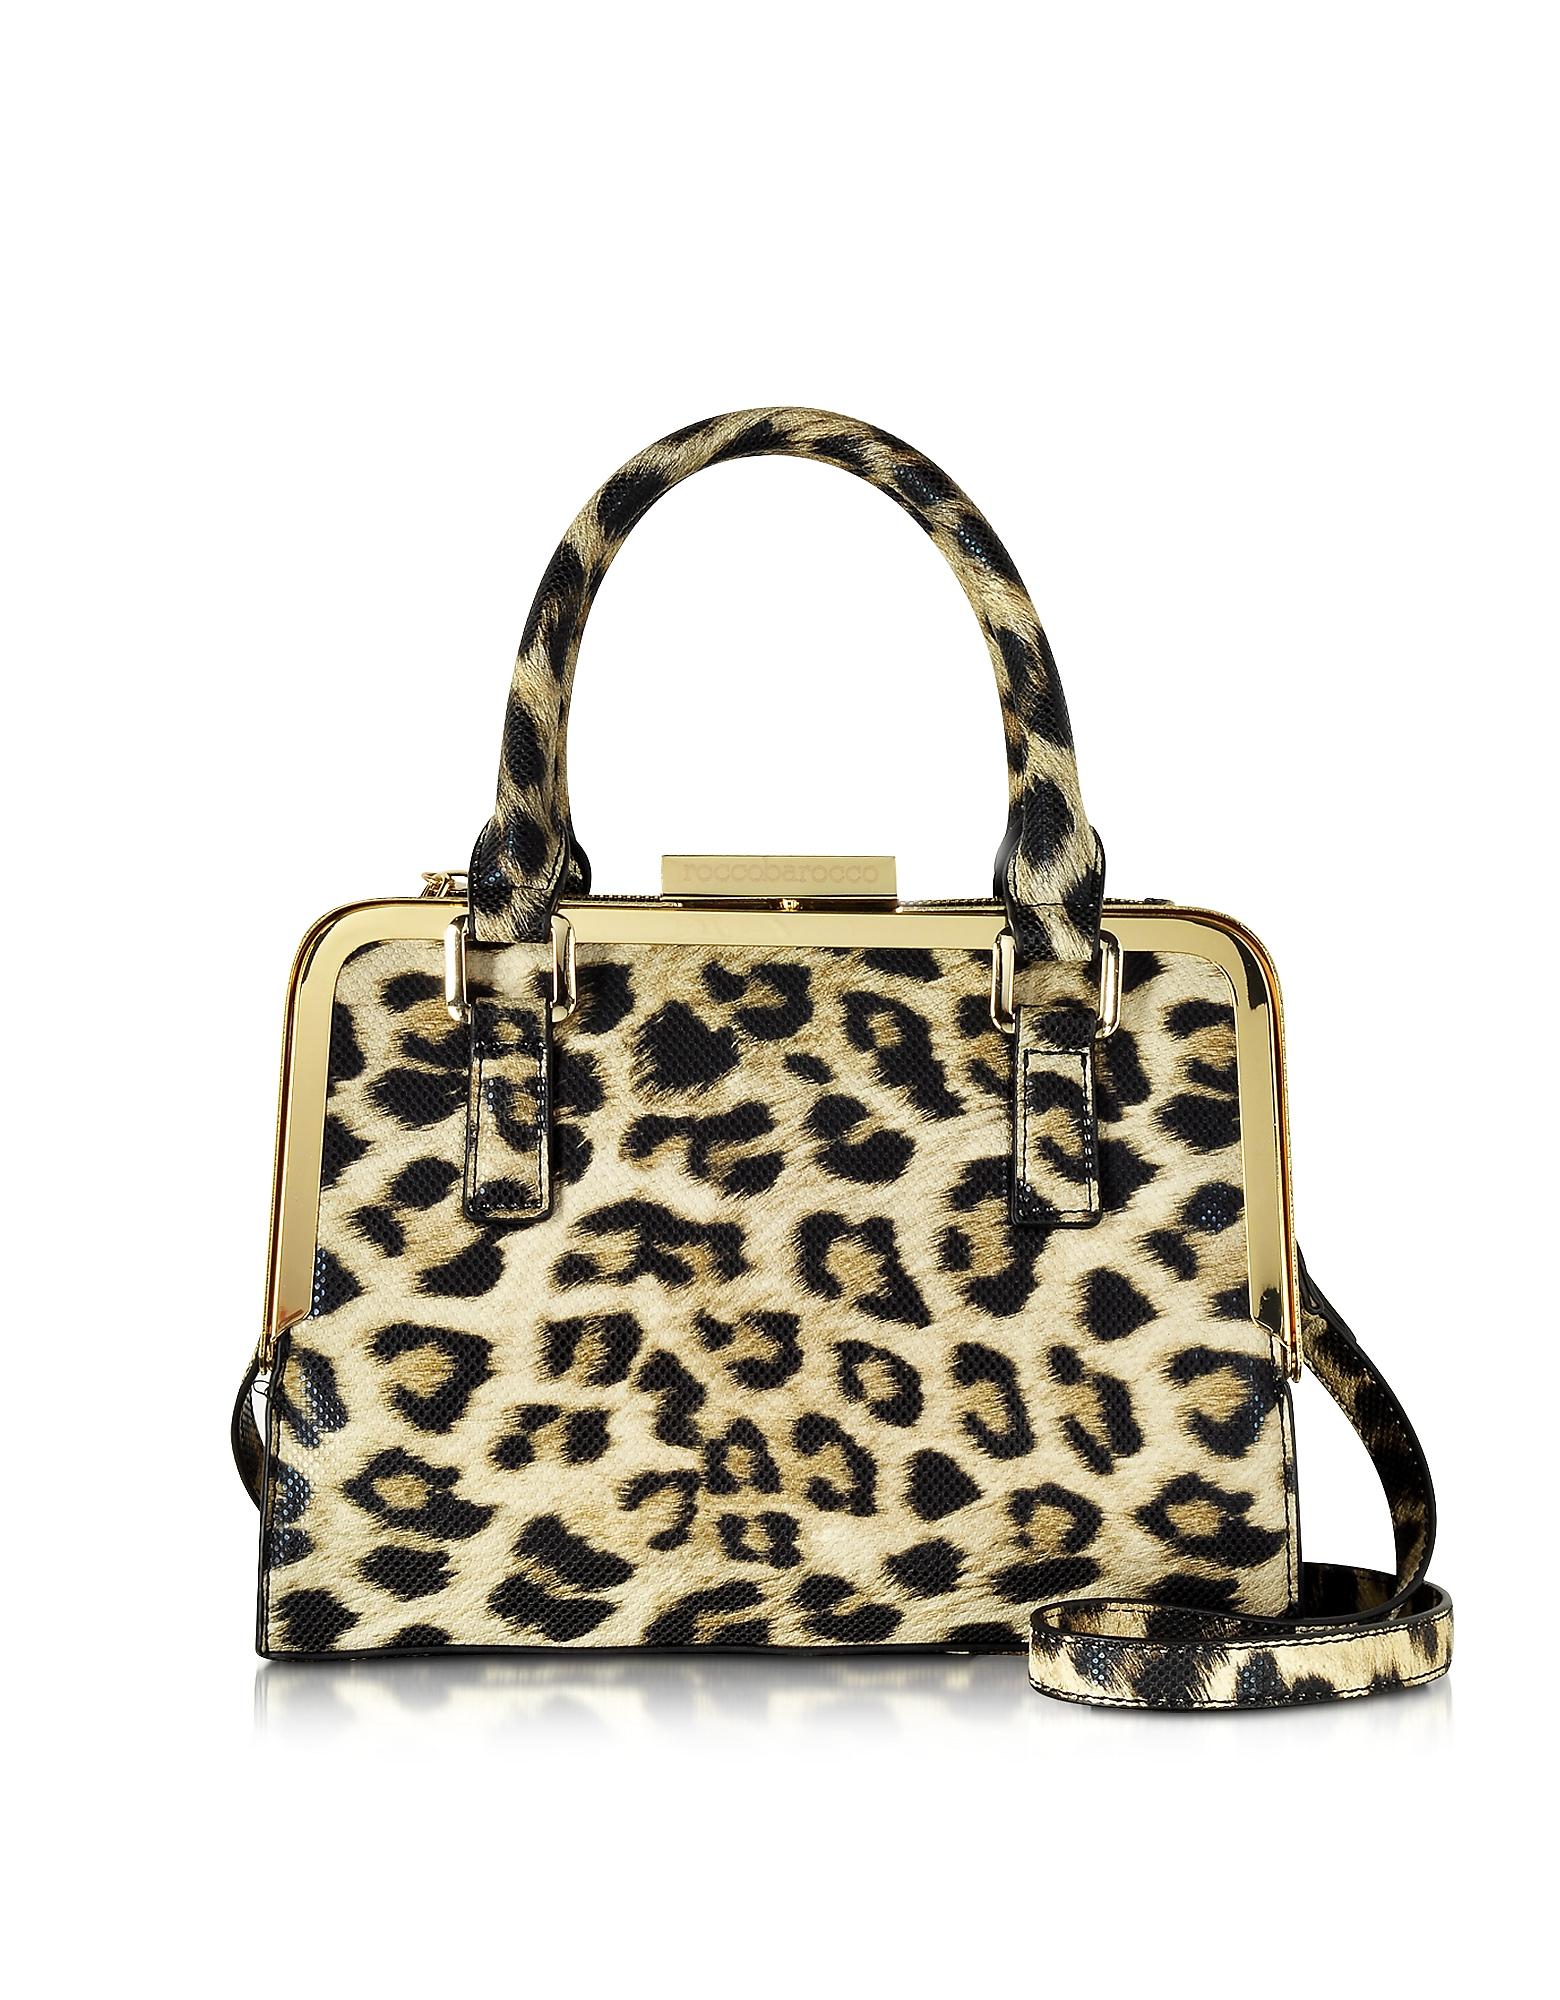 Roccobarocco Lyric Animal Print Eco Leather Satchel Bag in ...